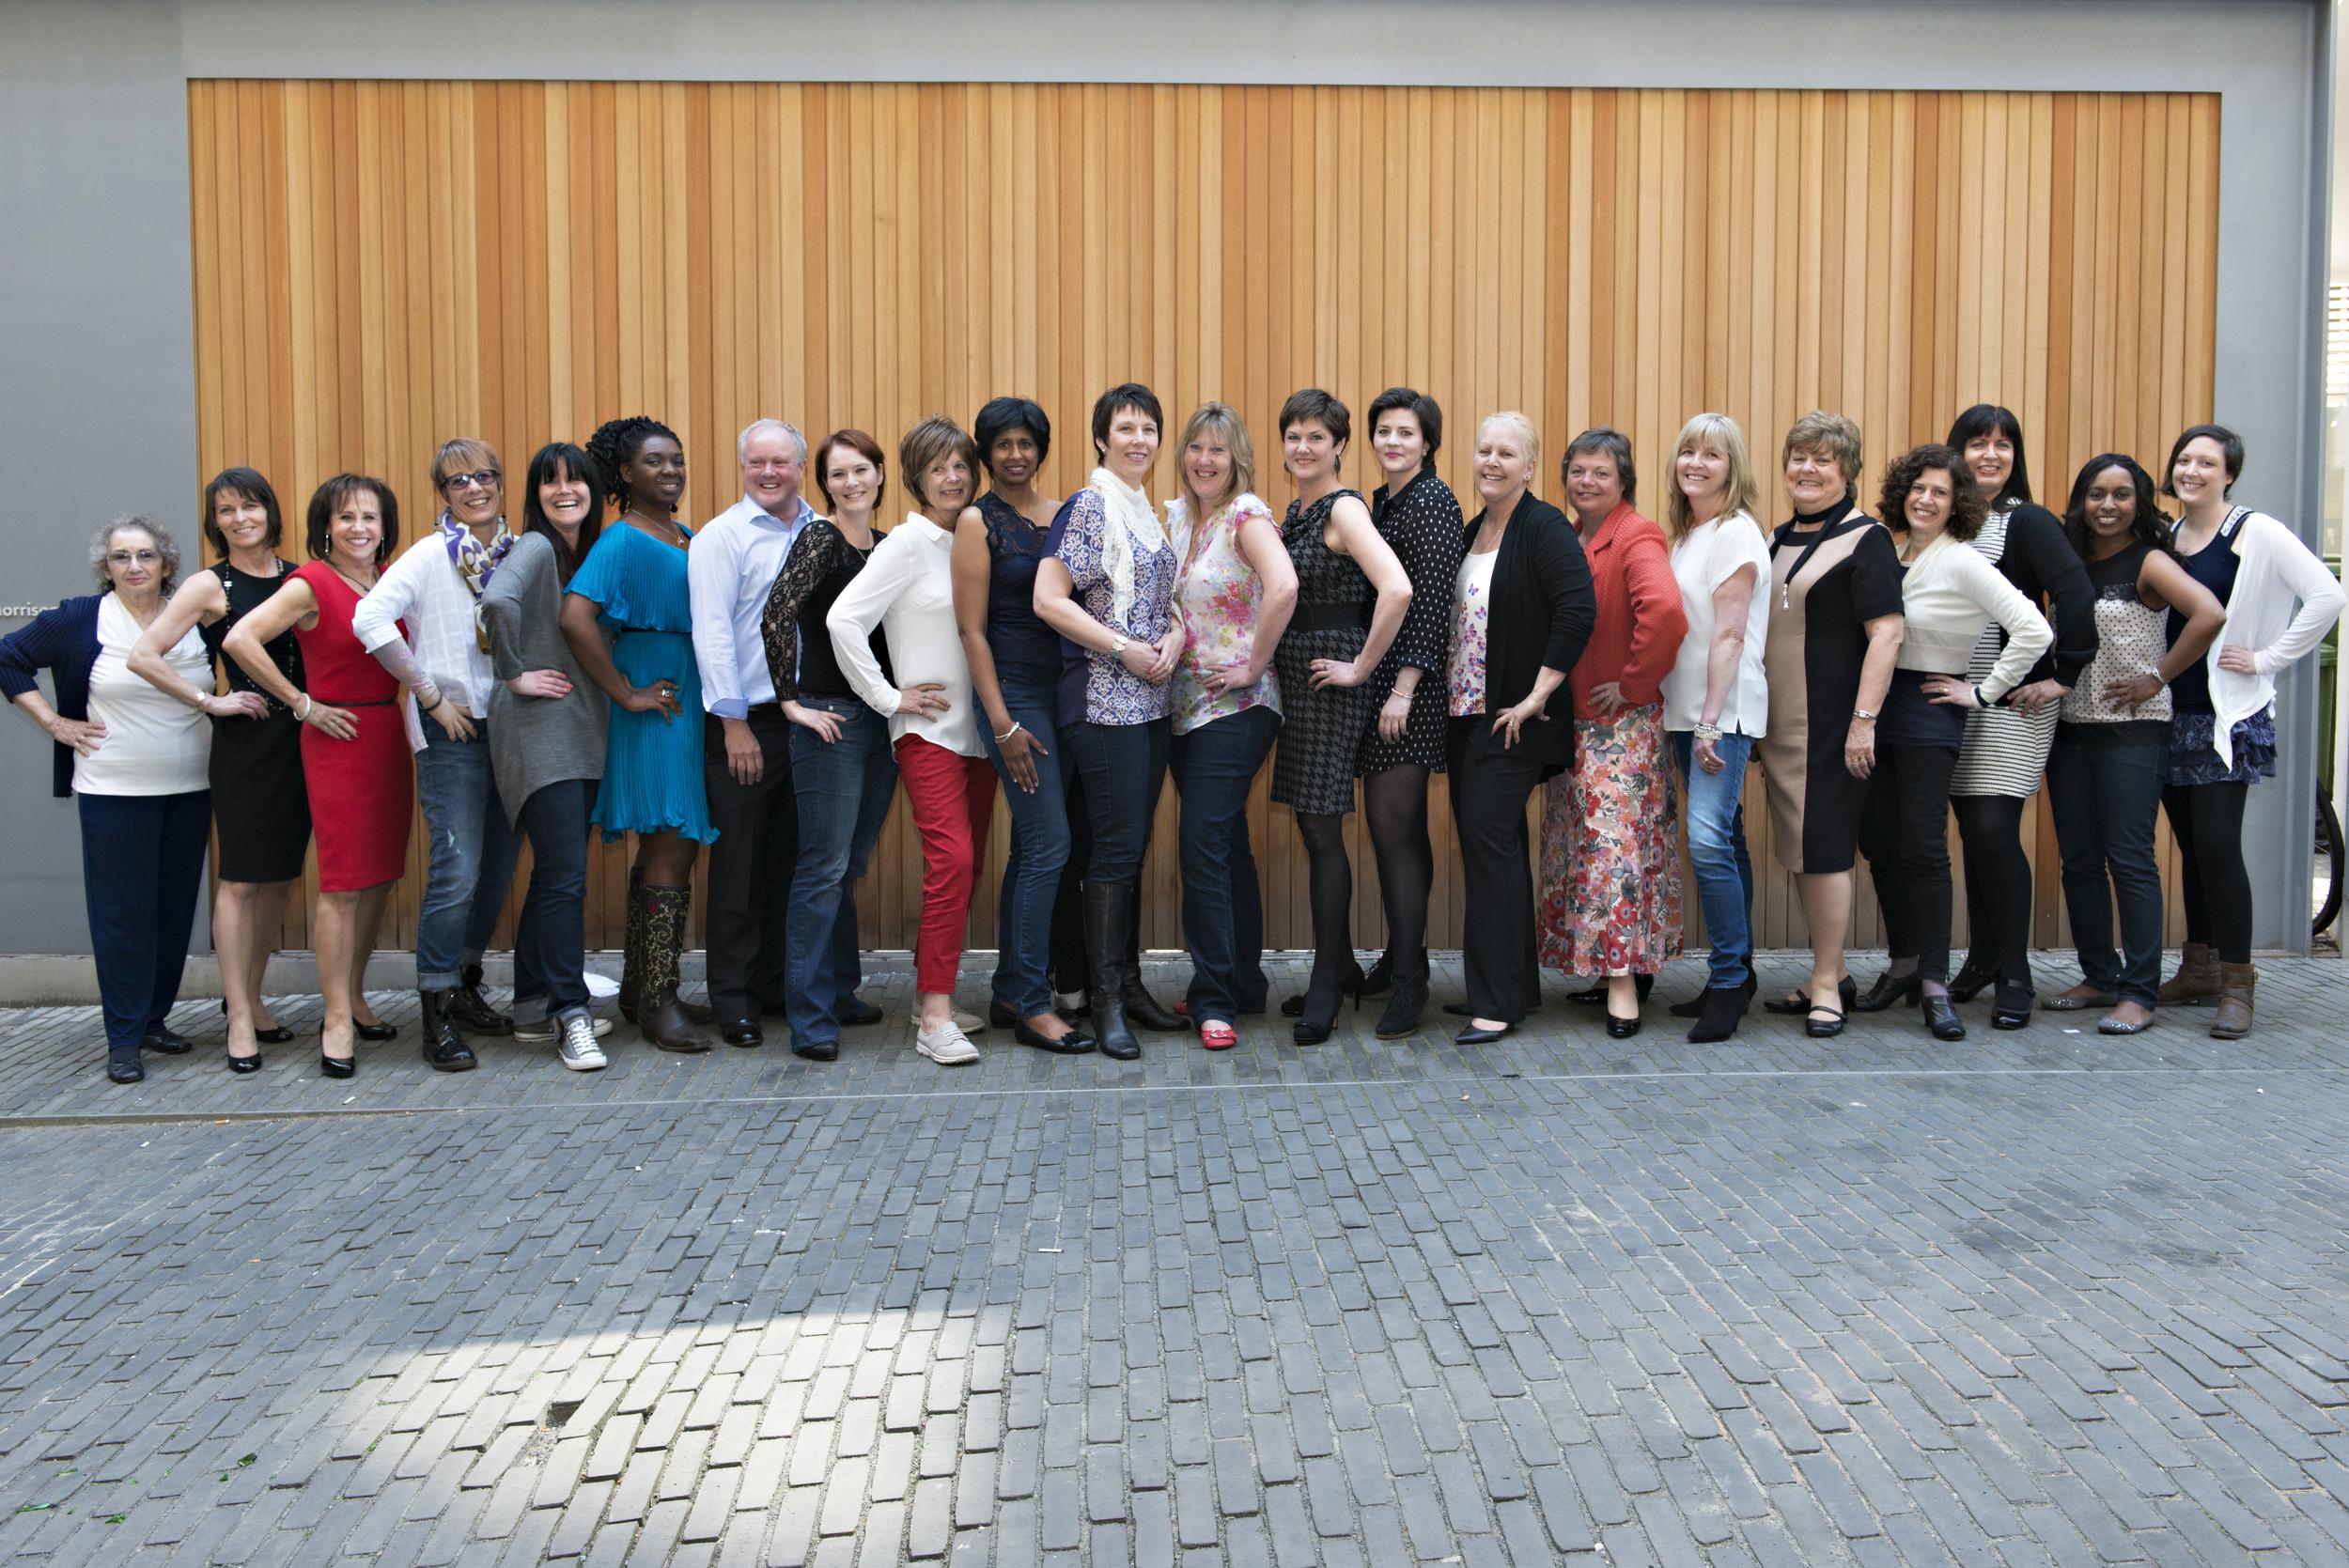 April 2014   Breast Cancer CareModels 2014 - Our first group shot